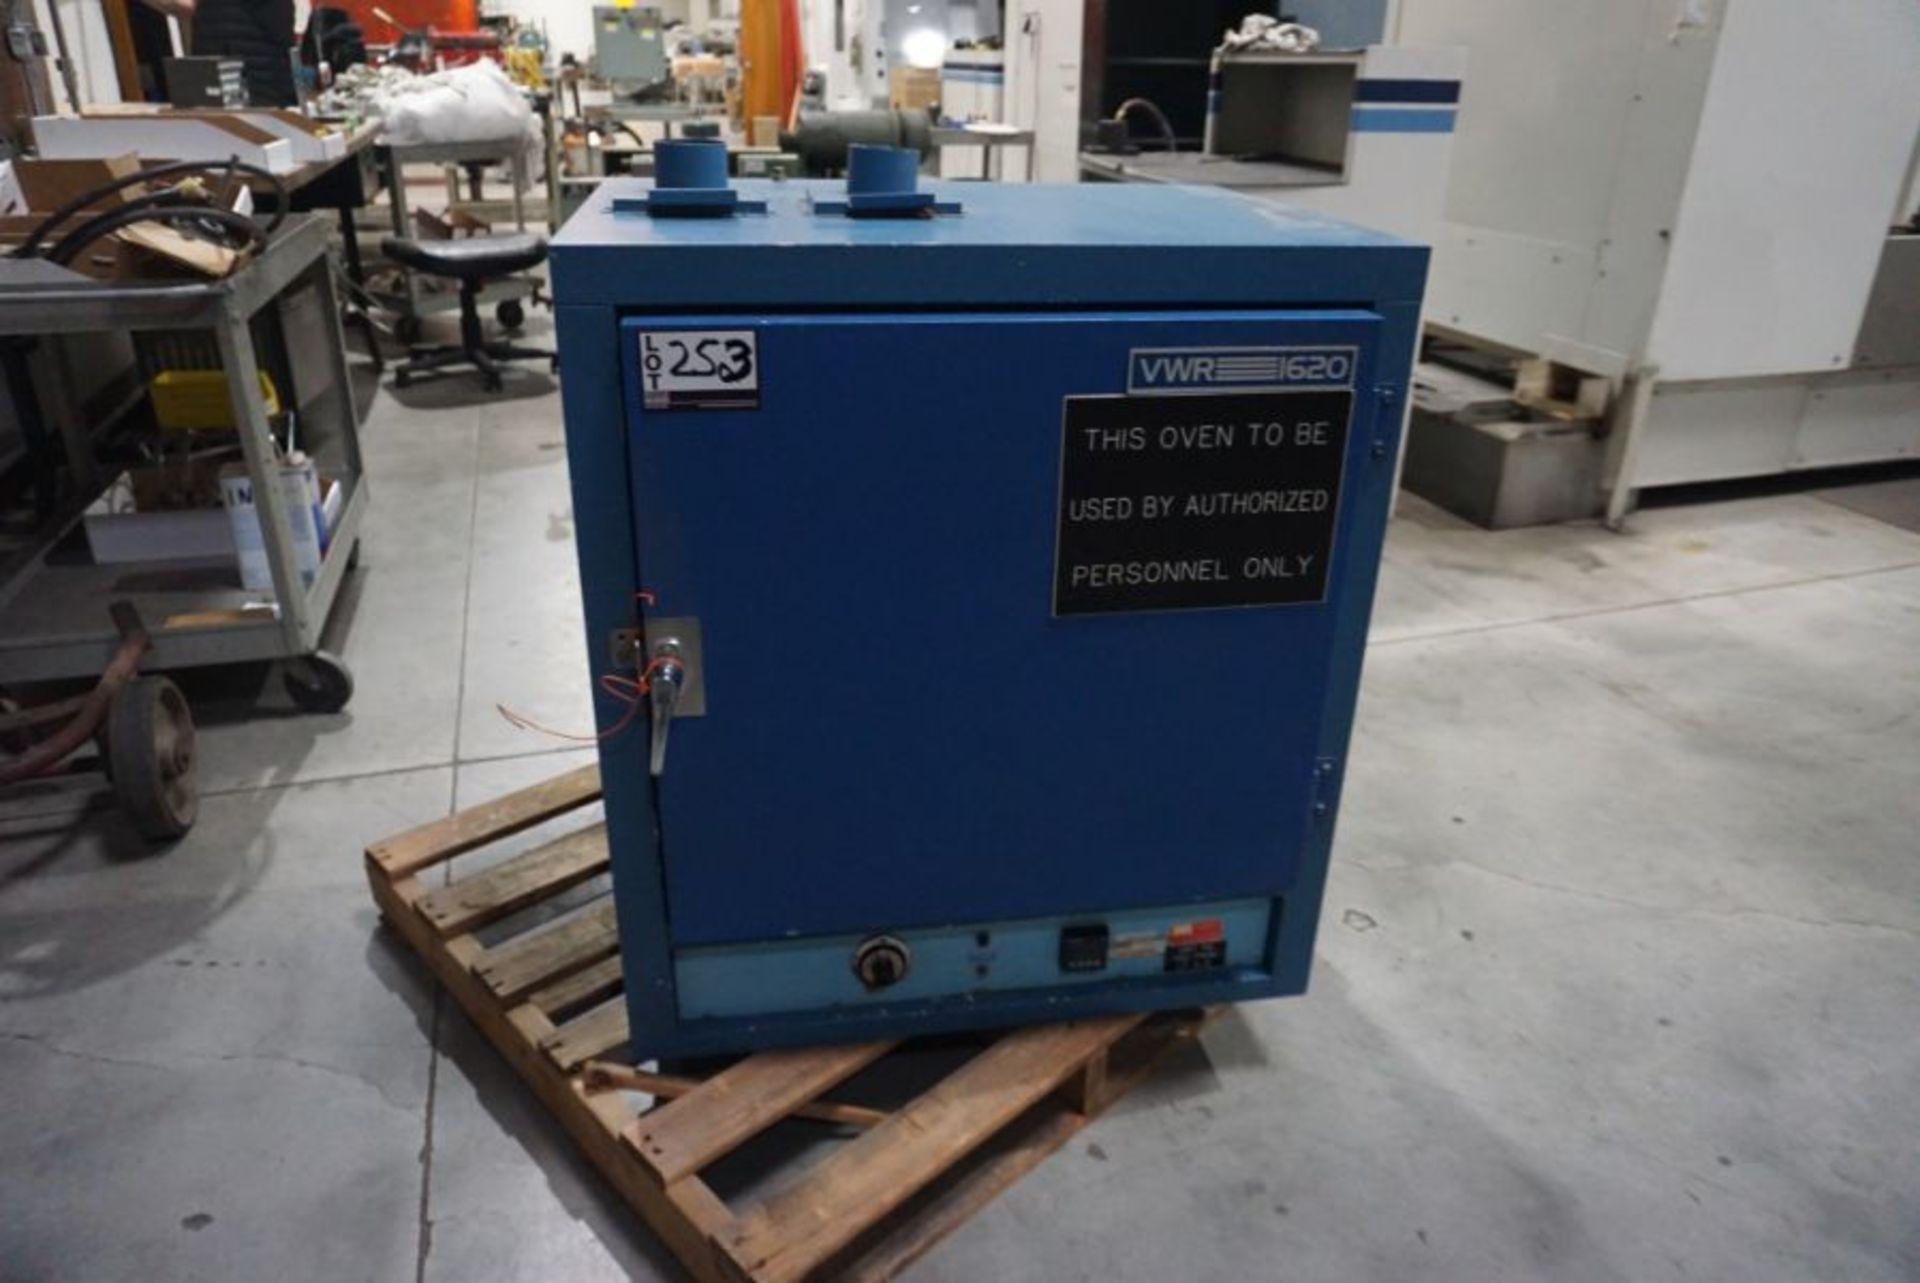 VWR-1620 Oven